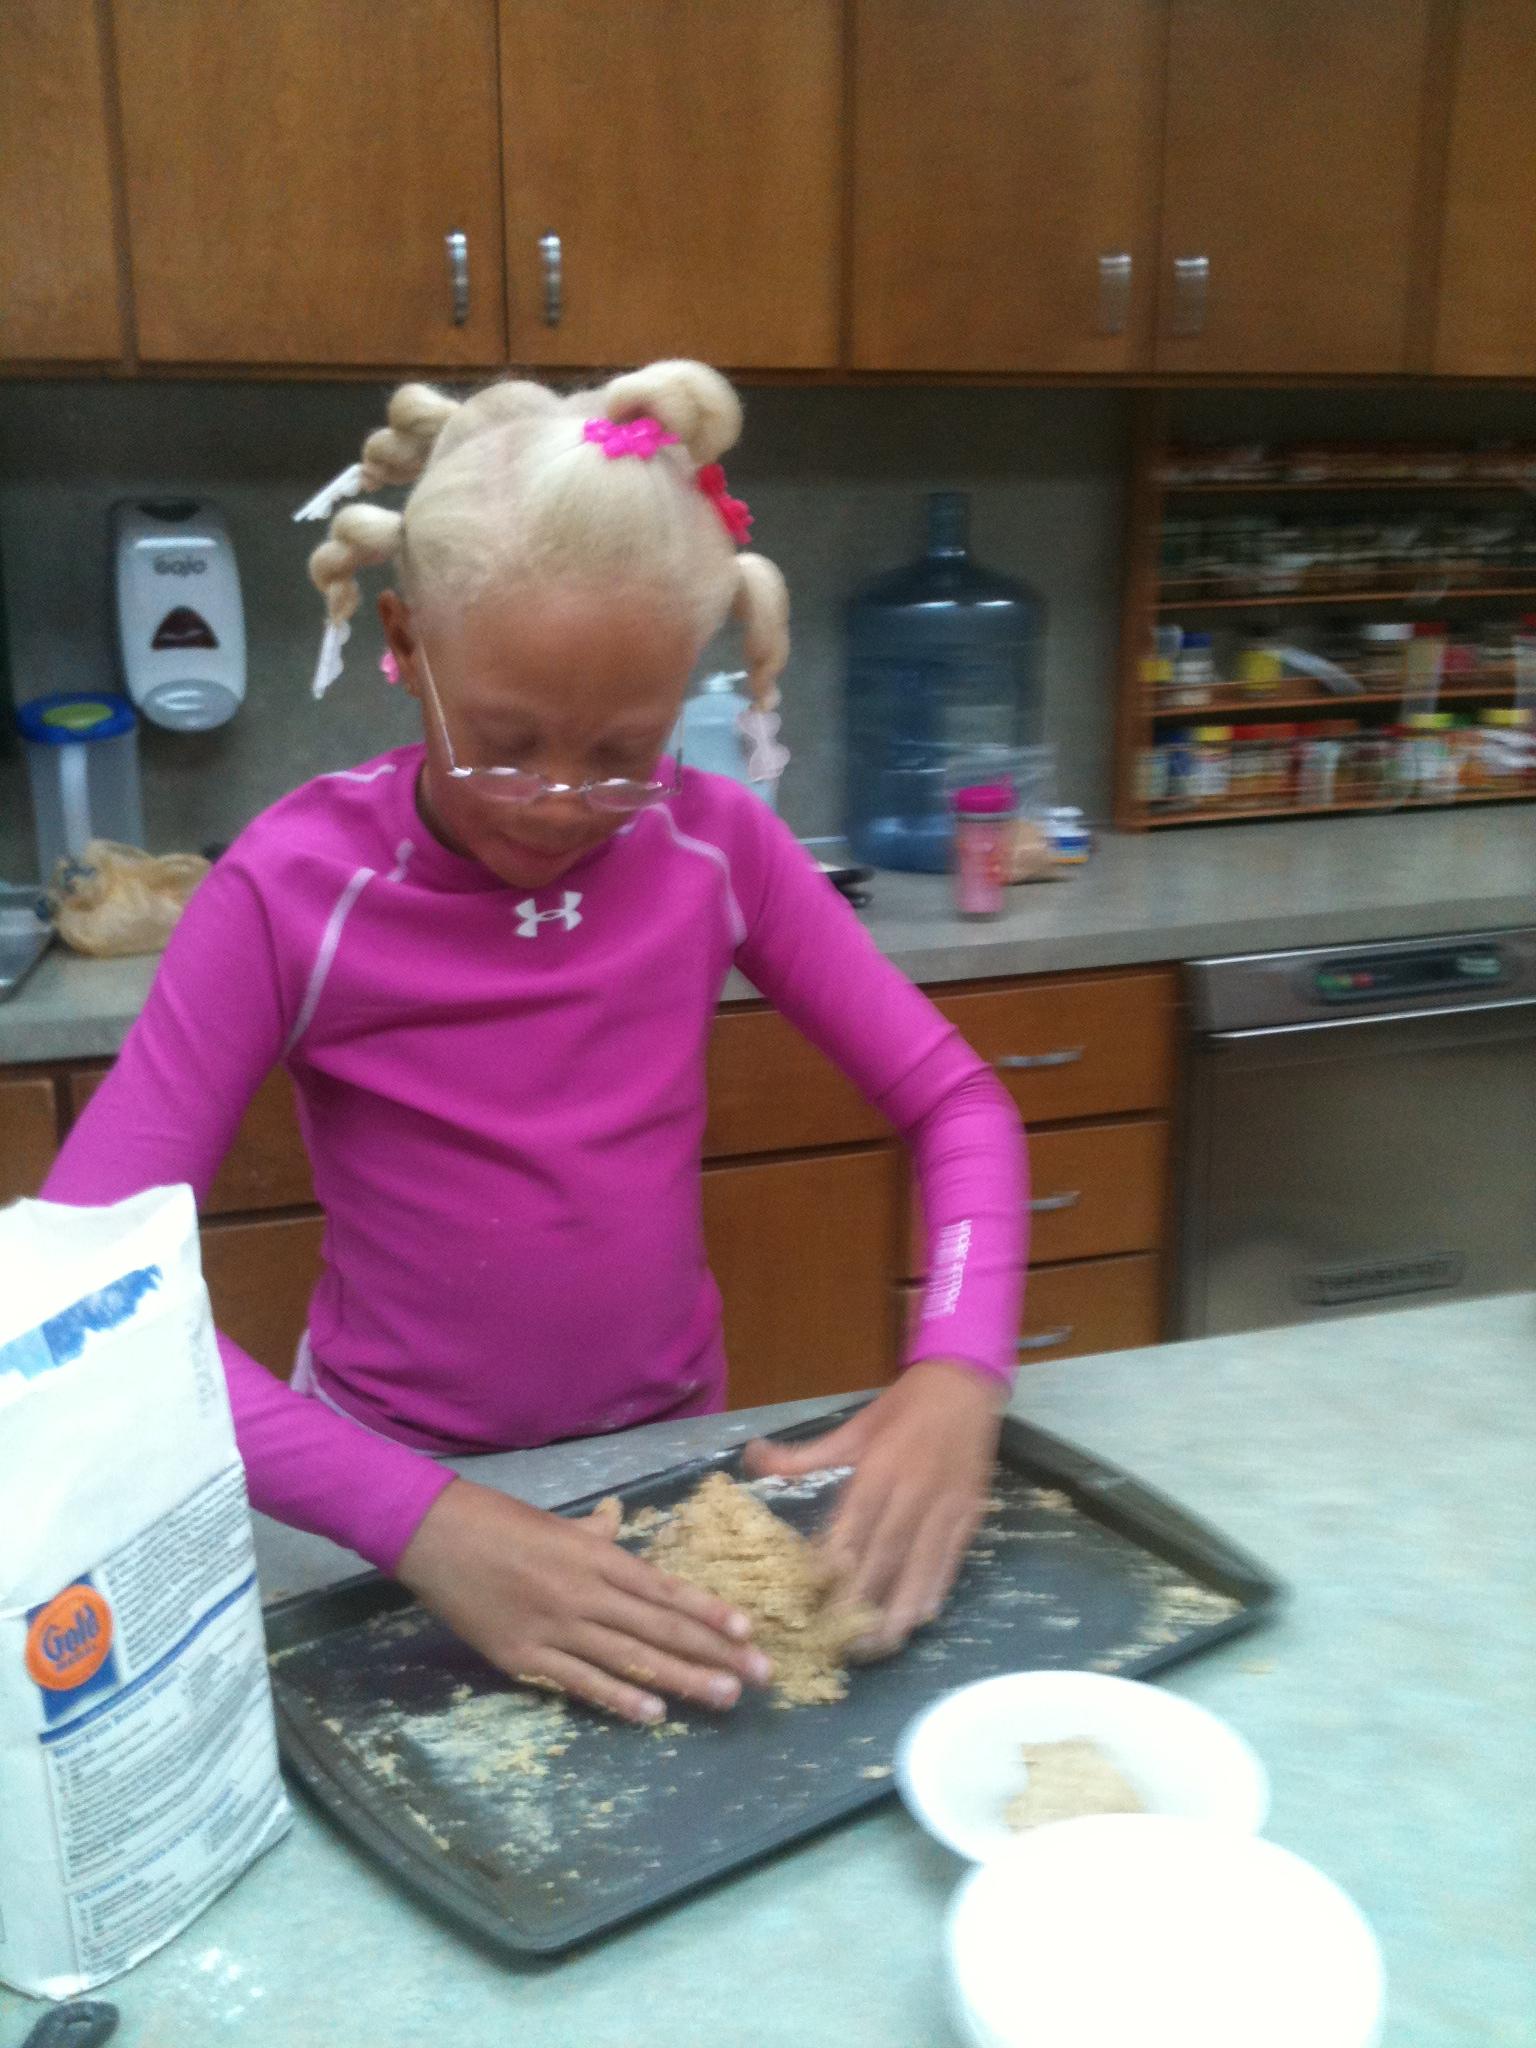 Kiona pounds her edible playdoh